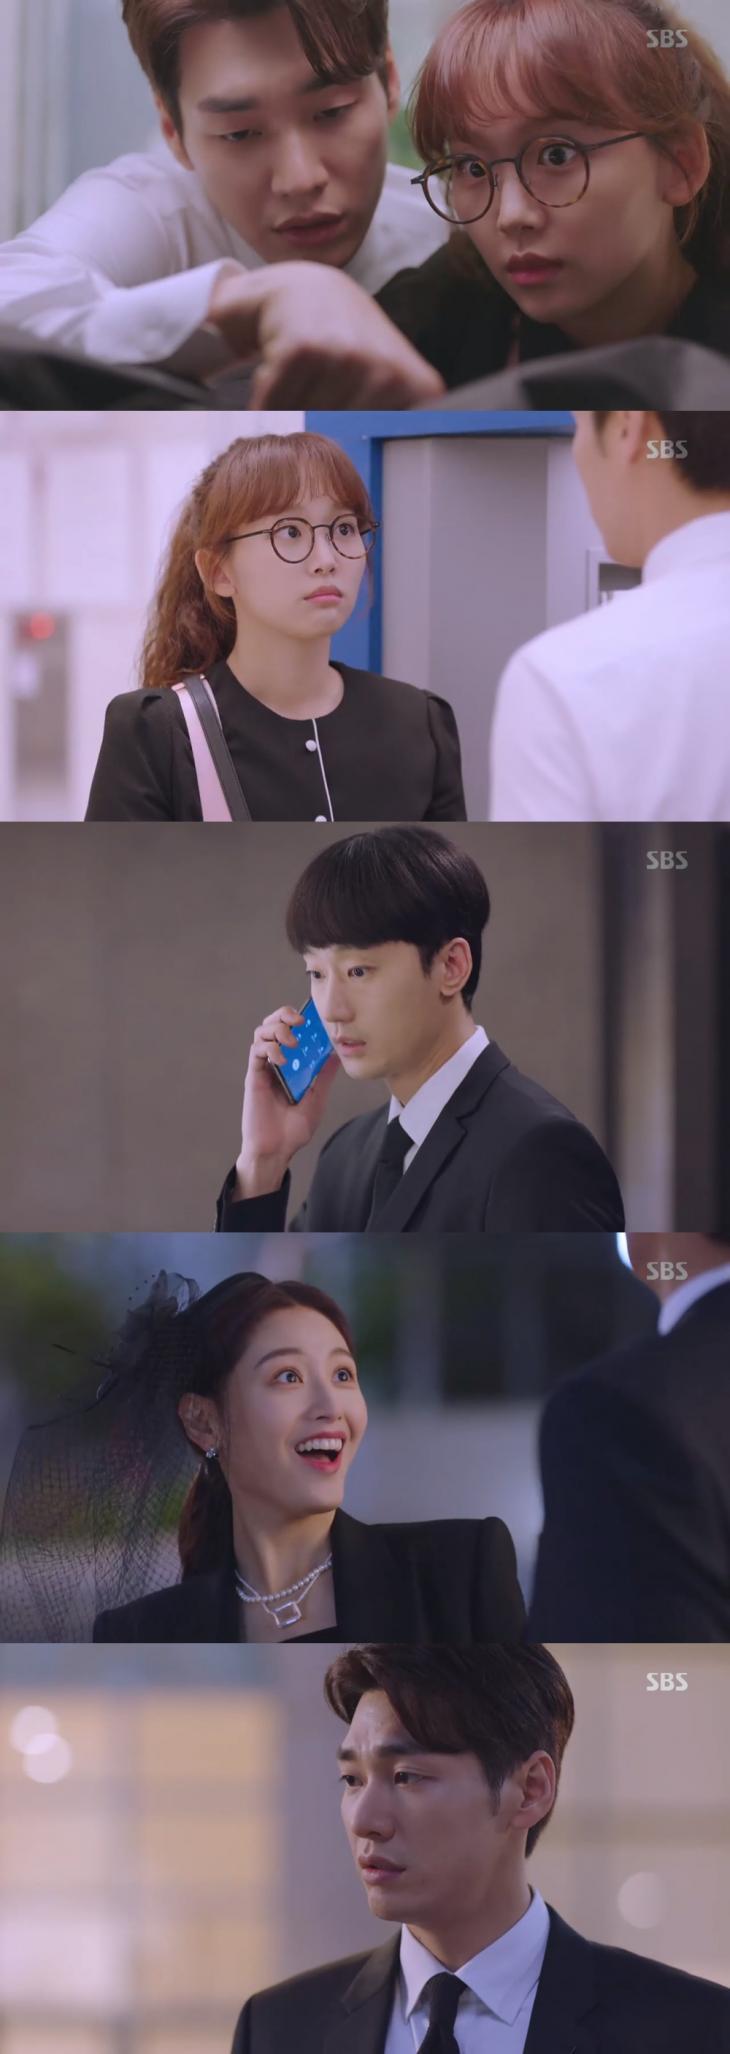 SBS '초면에 사랑합니다' 방송 캡쳐